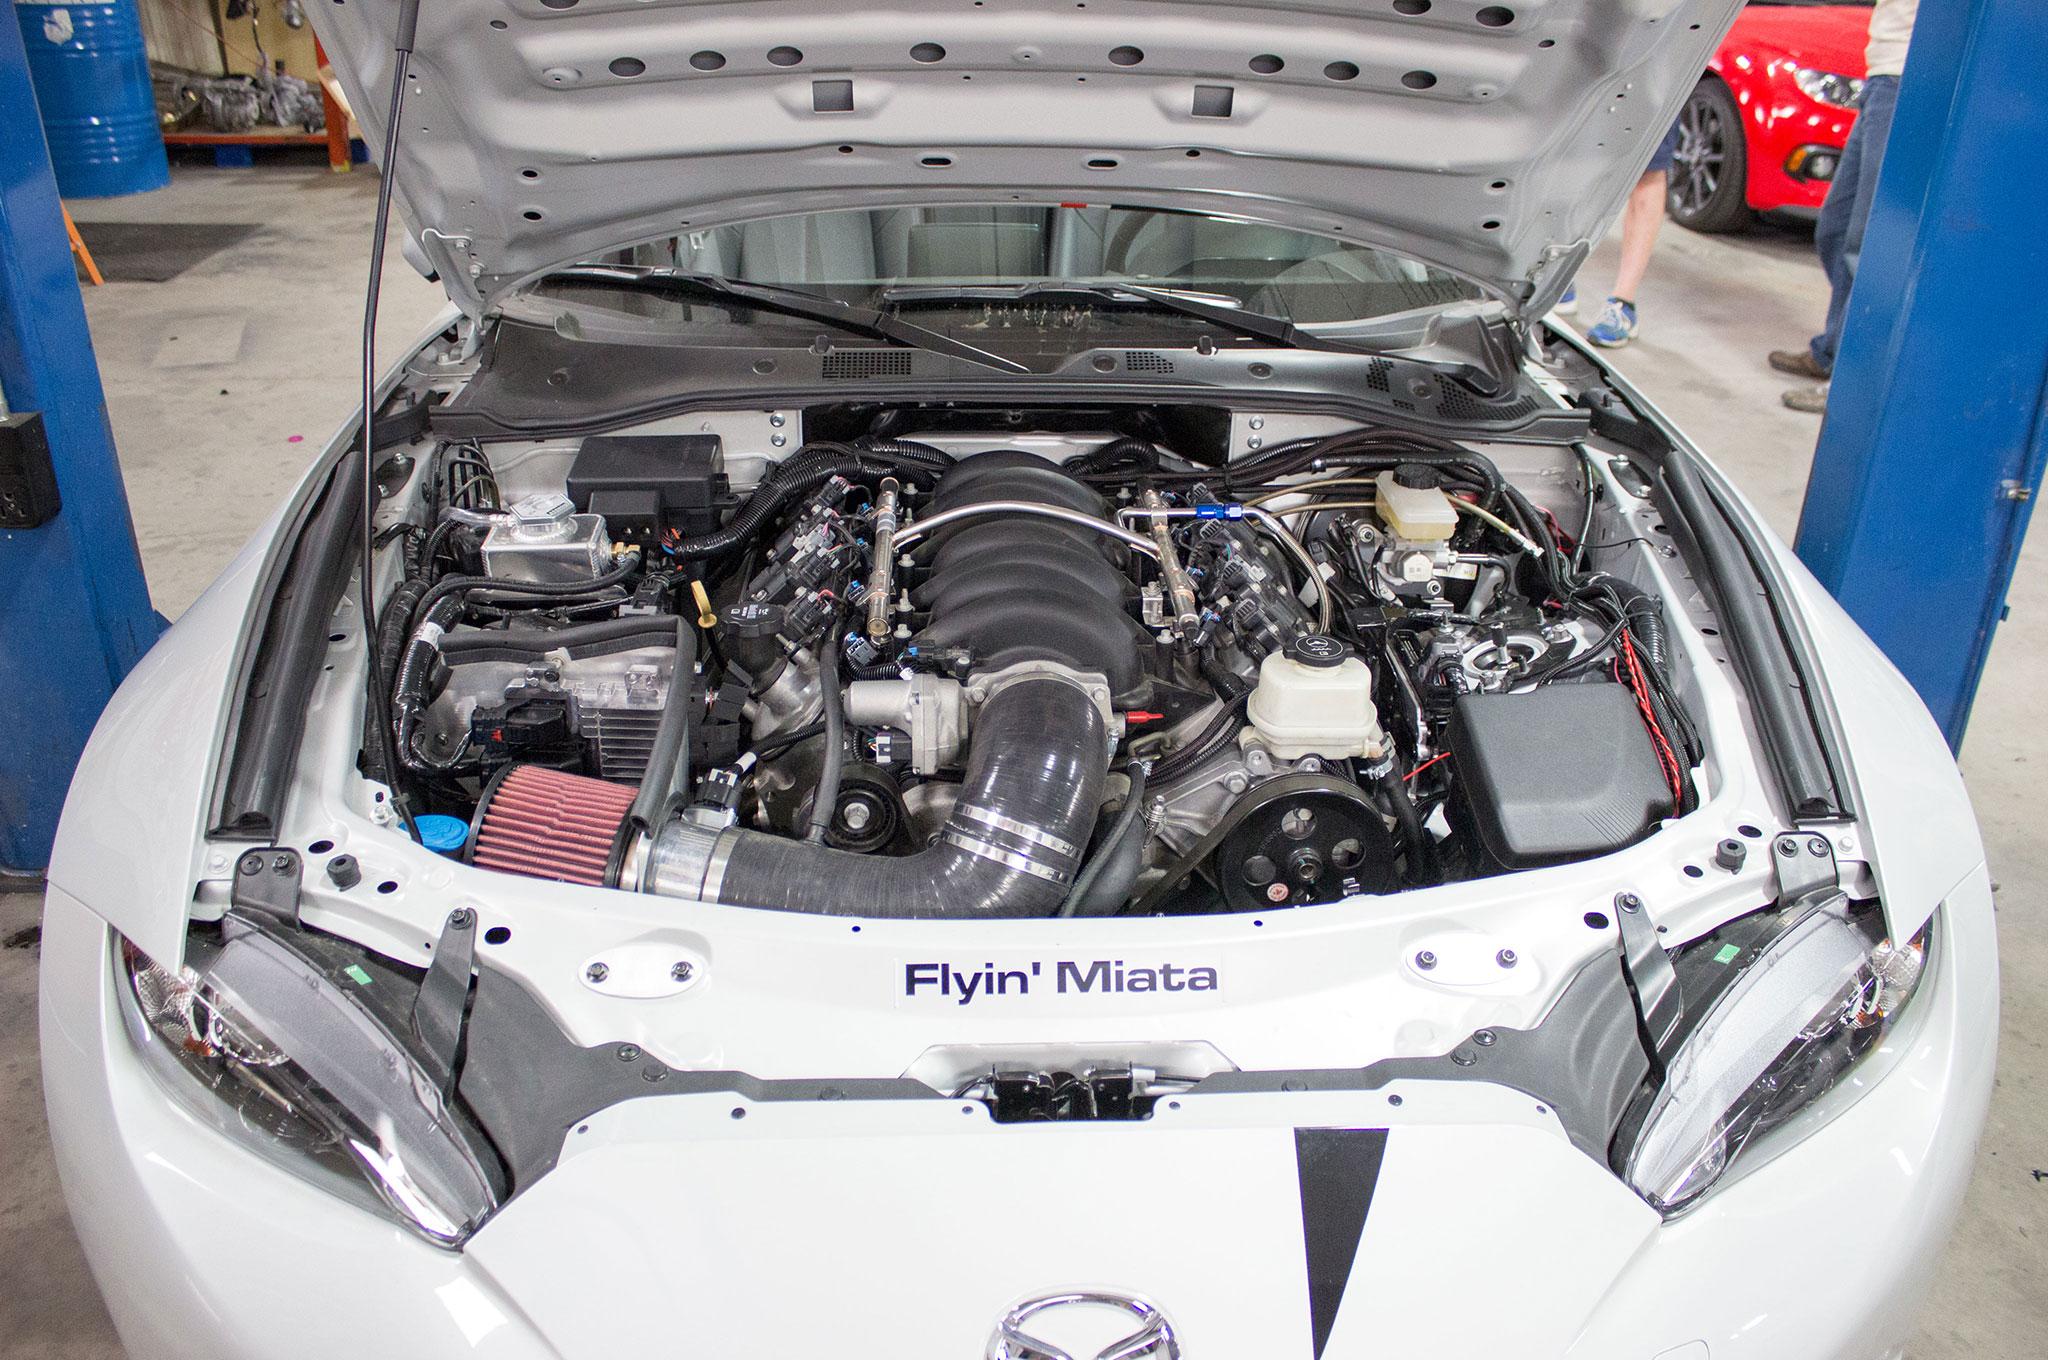 flyin miata v 8 conversion now available for nd mazda miata rh automobilemag com Miata Engine Swap Options Mazda Miata V8 Swap Kits